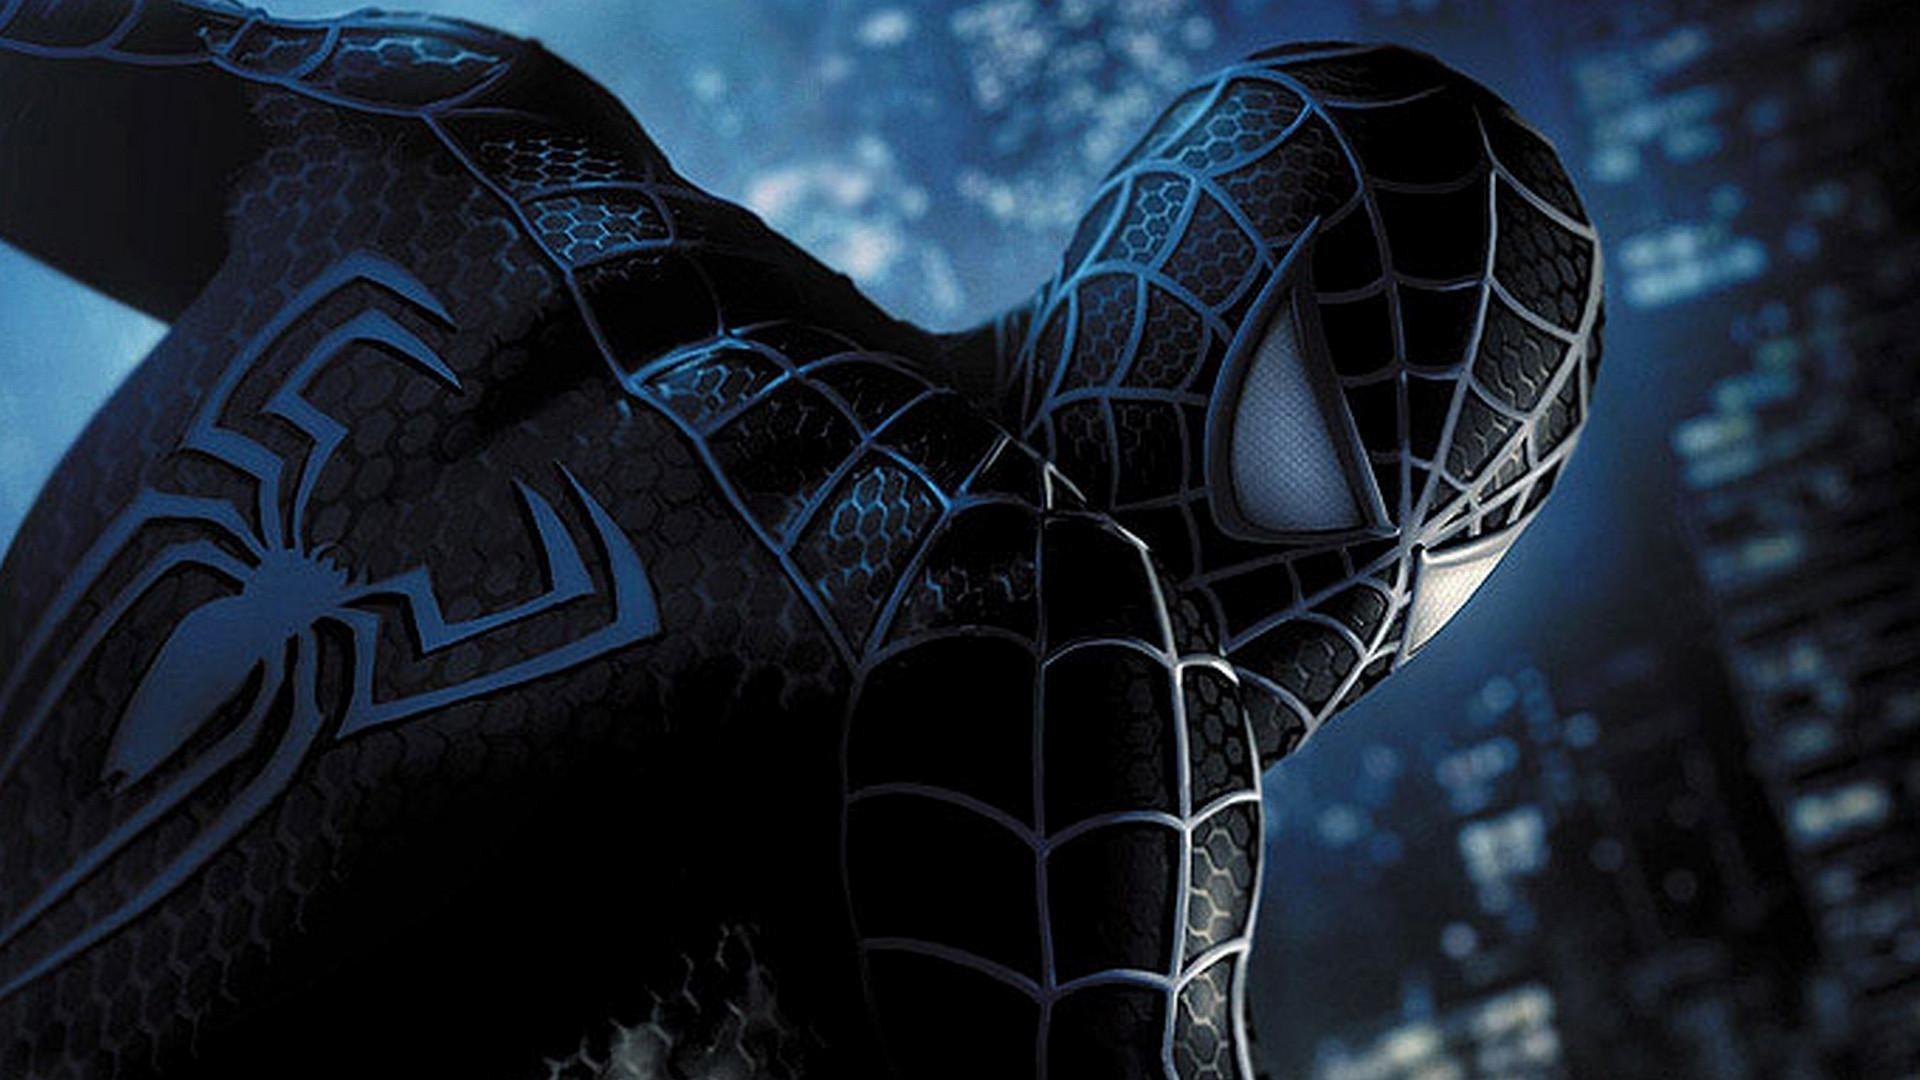 General 1920x1080 black suit Spider-Man 3 Spider-Man superhero movies Marvel Comics